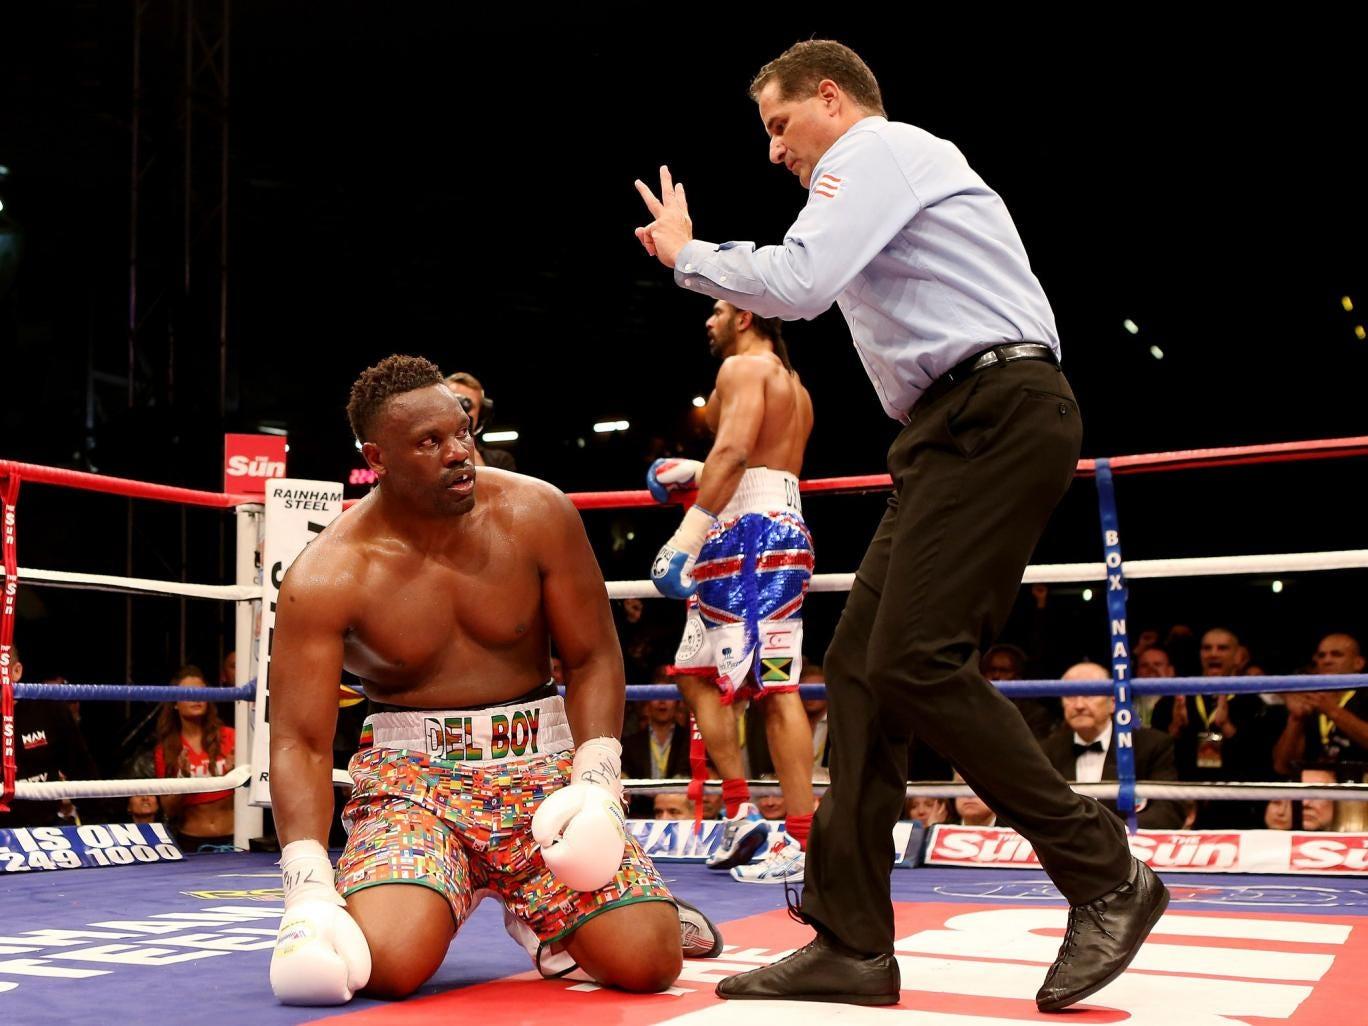 Dereck Chisora: The boxer who threatened to shoot David Haye